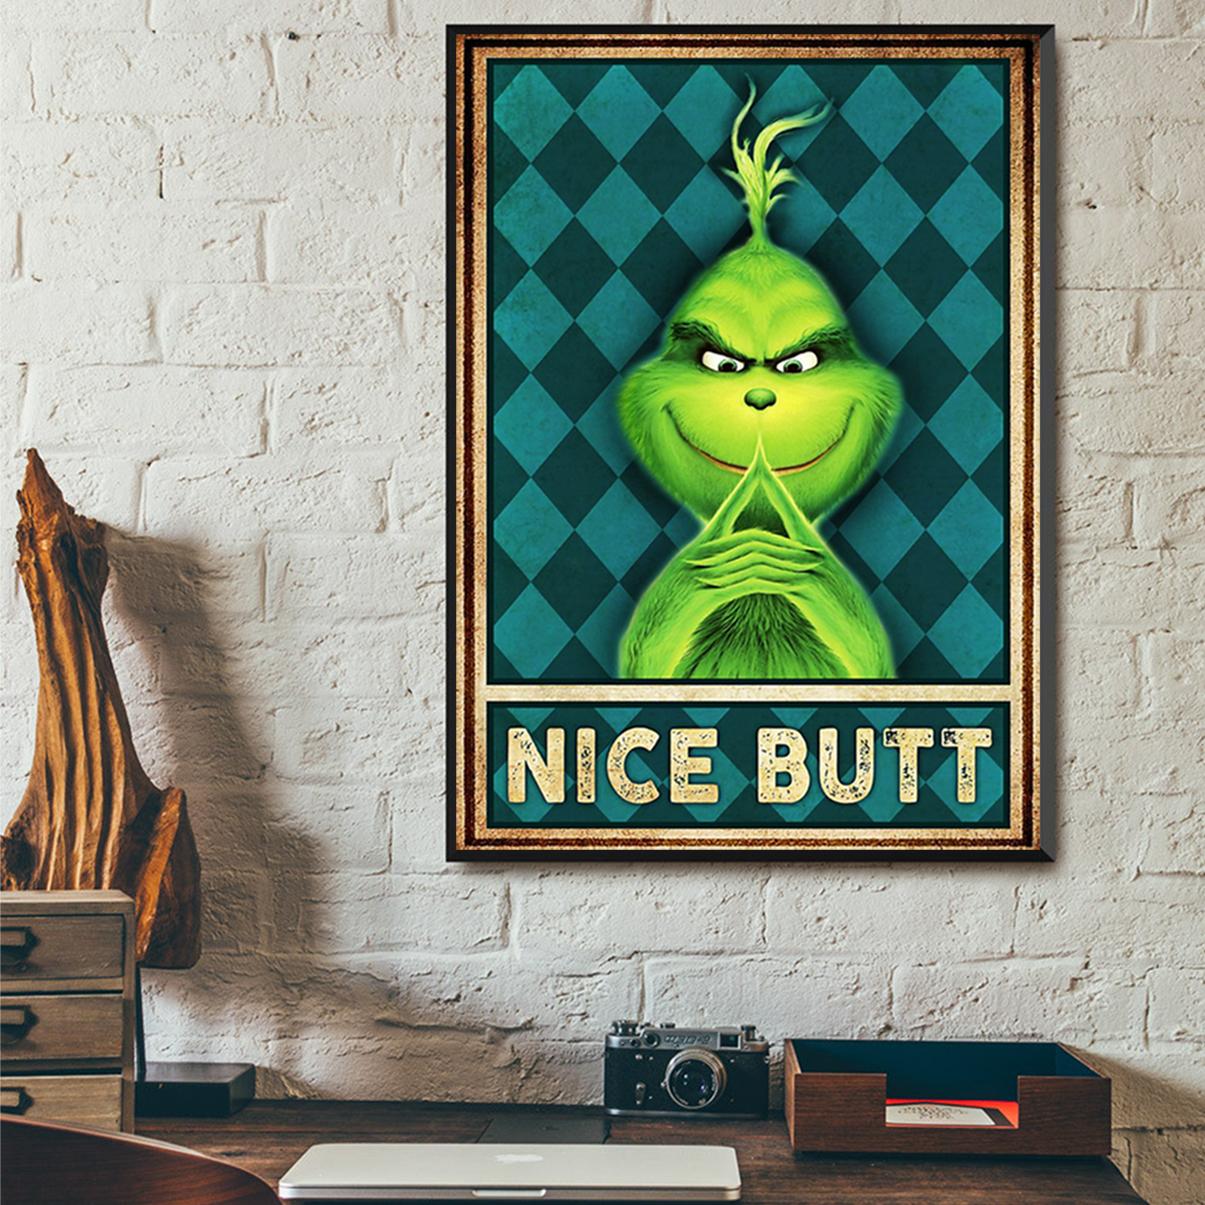 Grinch nice butt poster A2